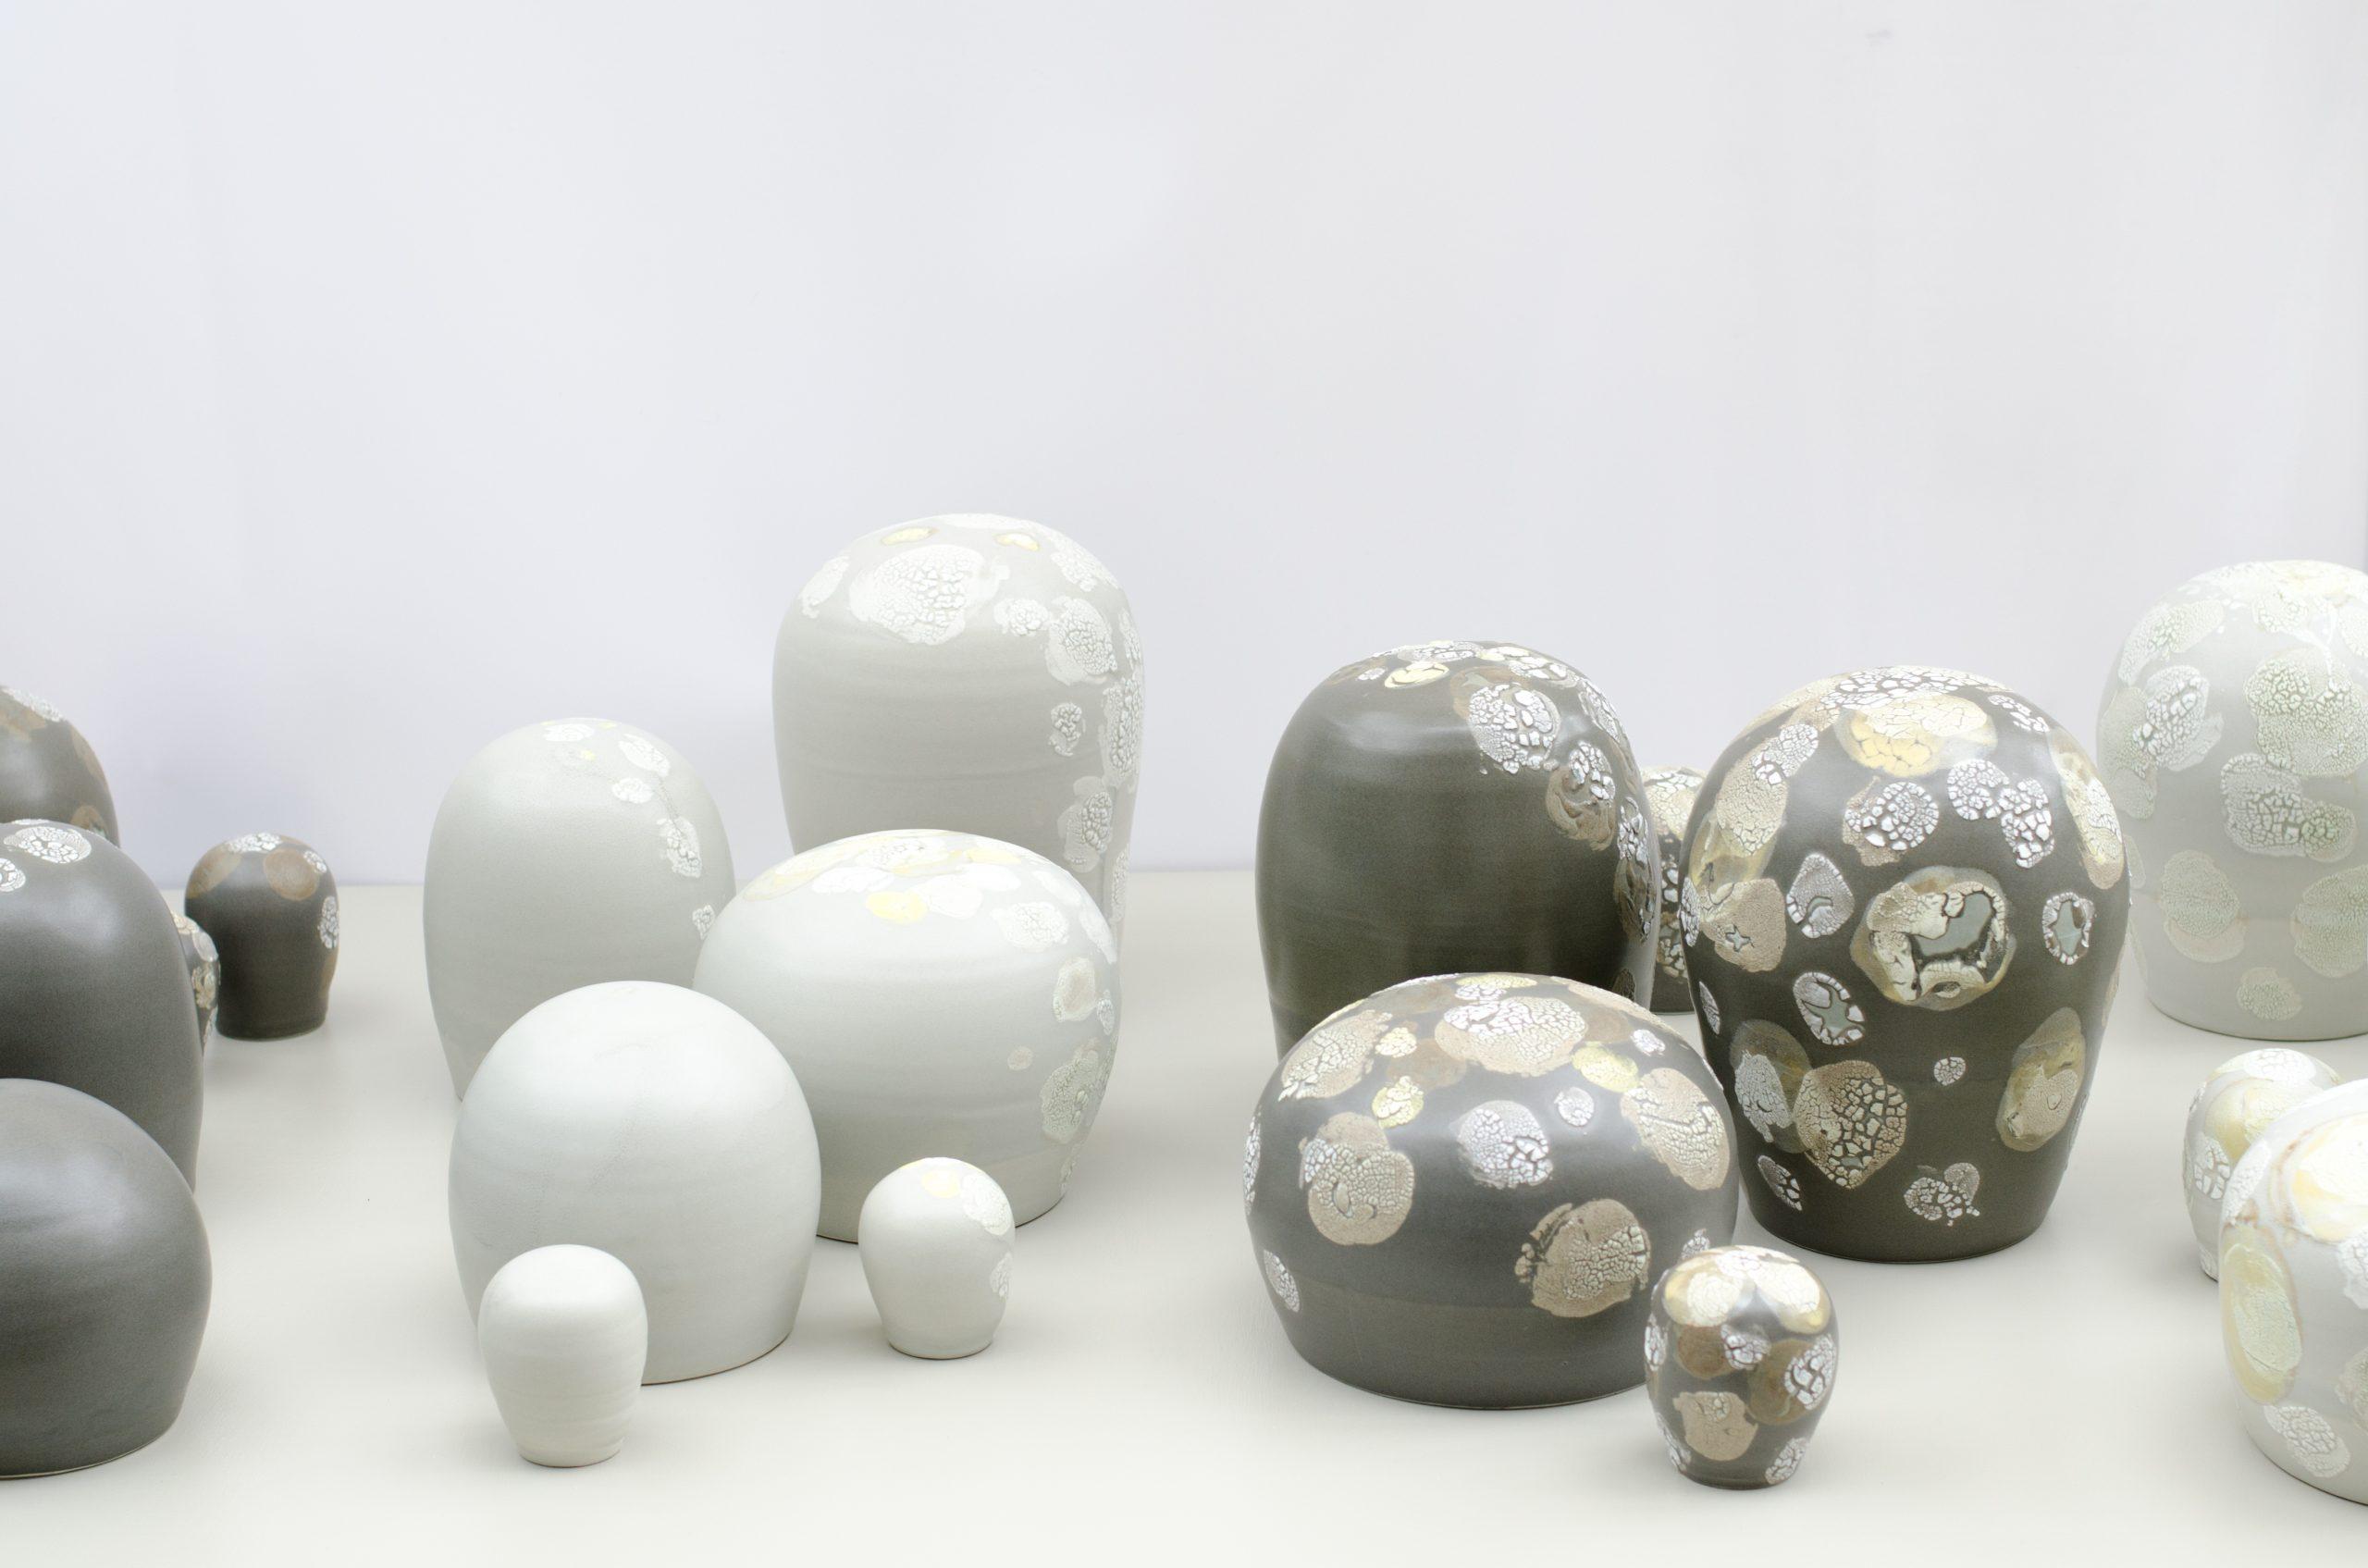 Lichen-glazed porcelain sculptural forms